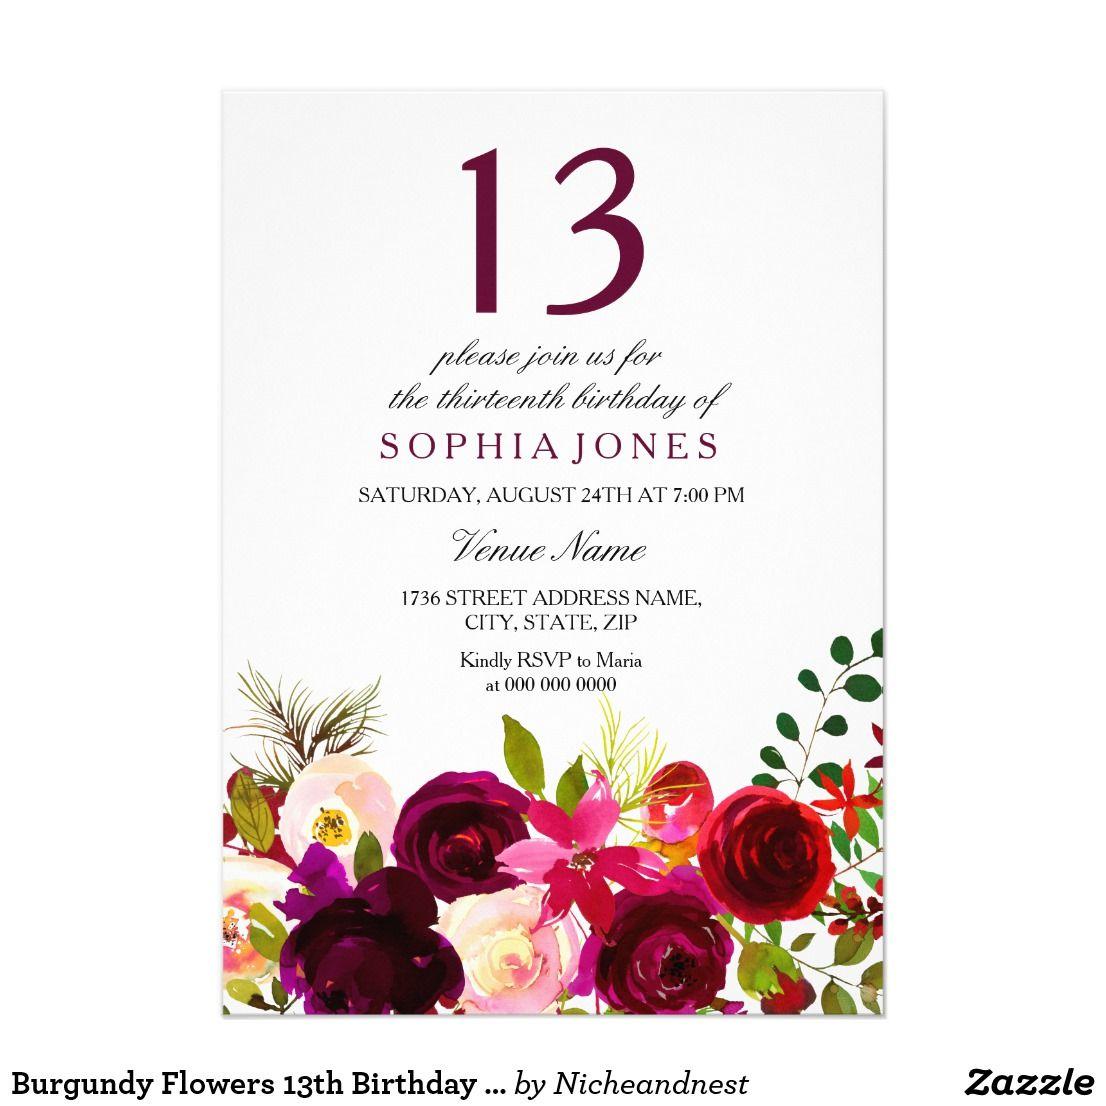 Burgundy Flowers 13th Birthday Party Invite | 13th Birthday Party ...